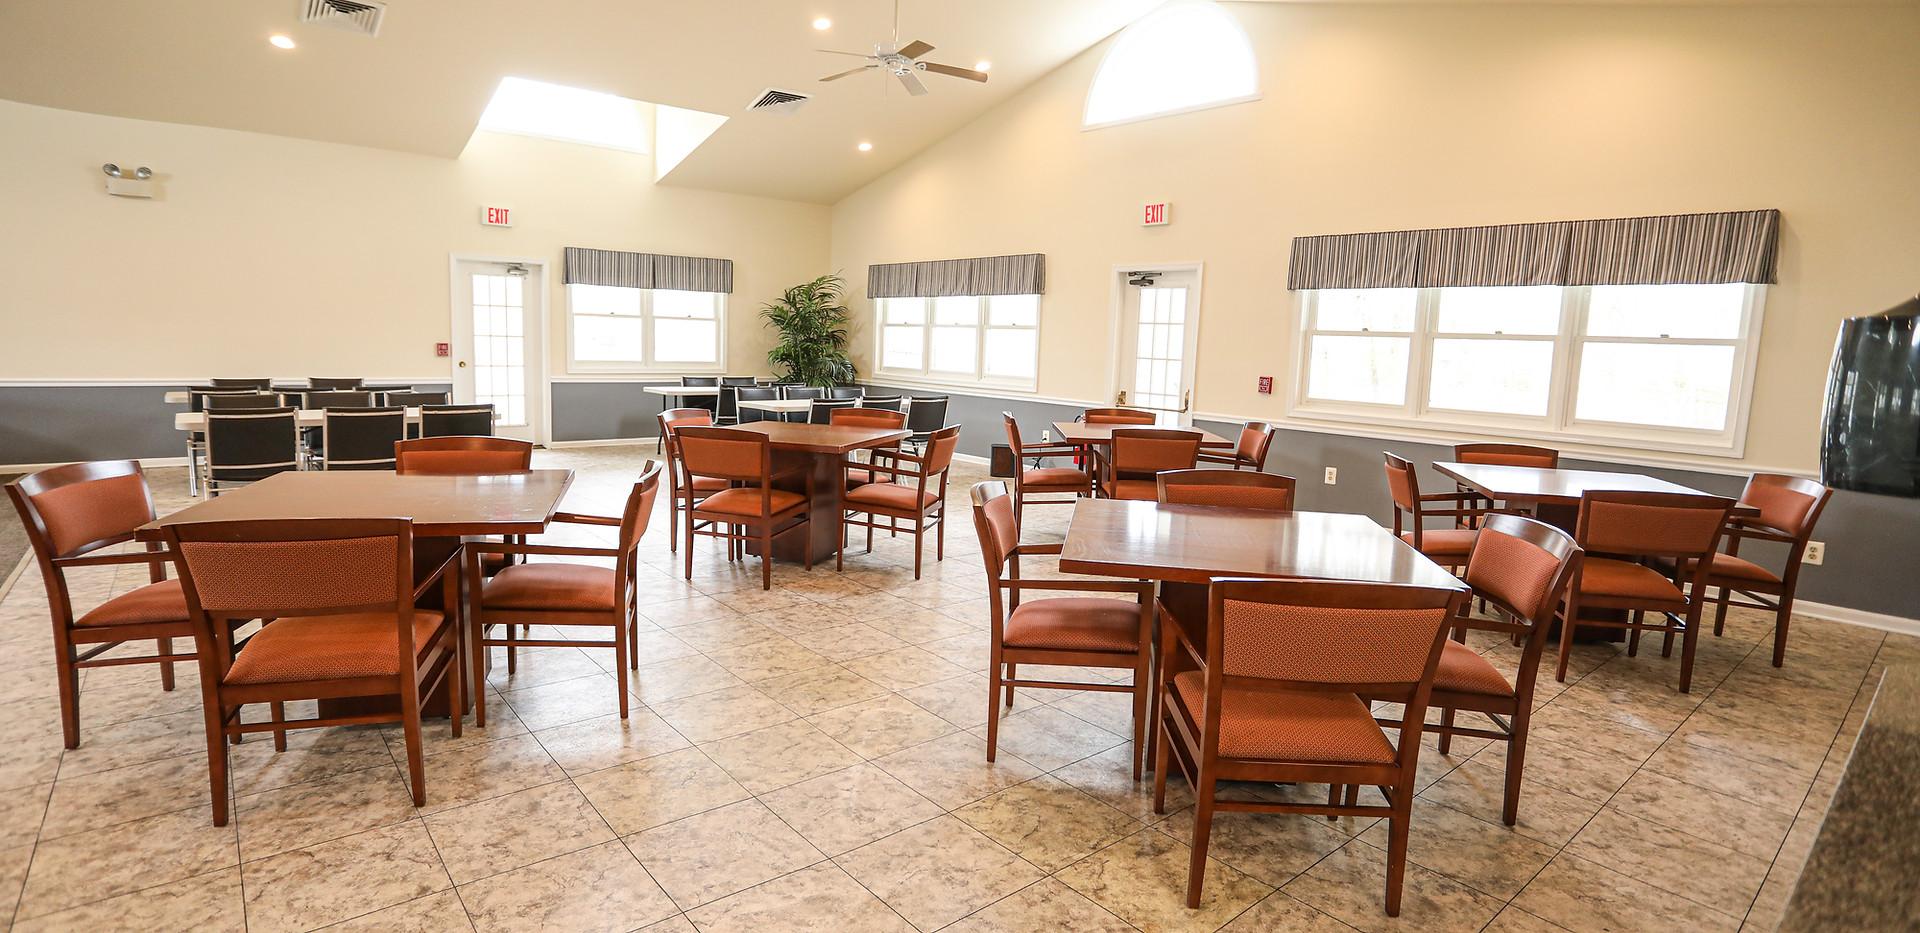 TM_Dining Hall-2.jpg